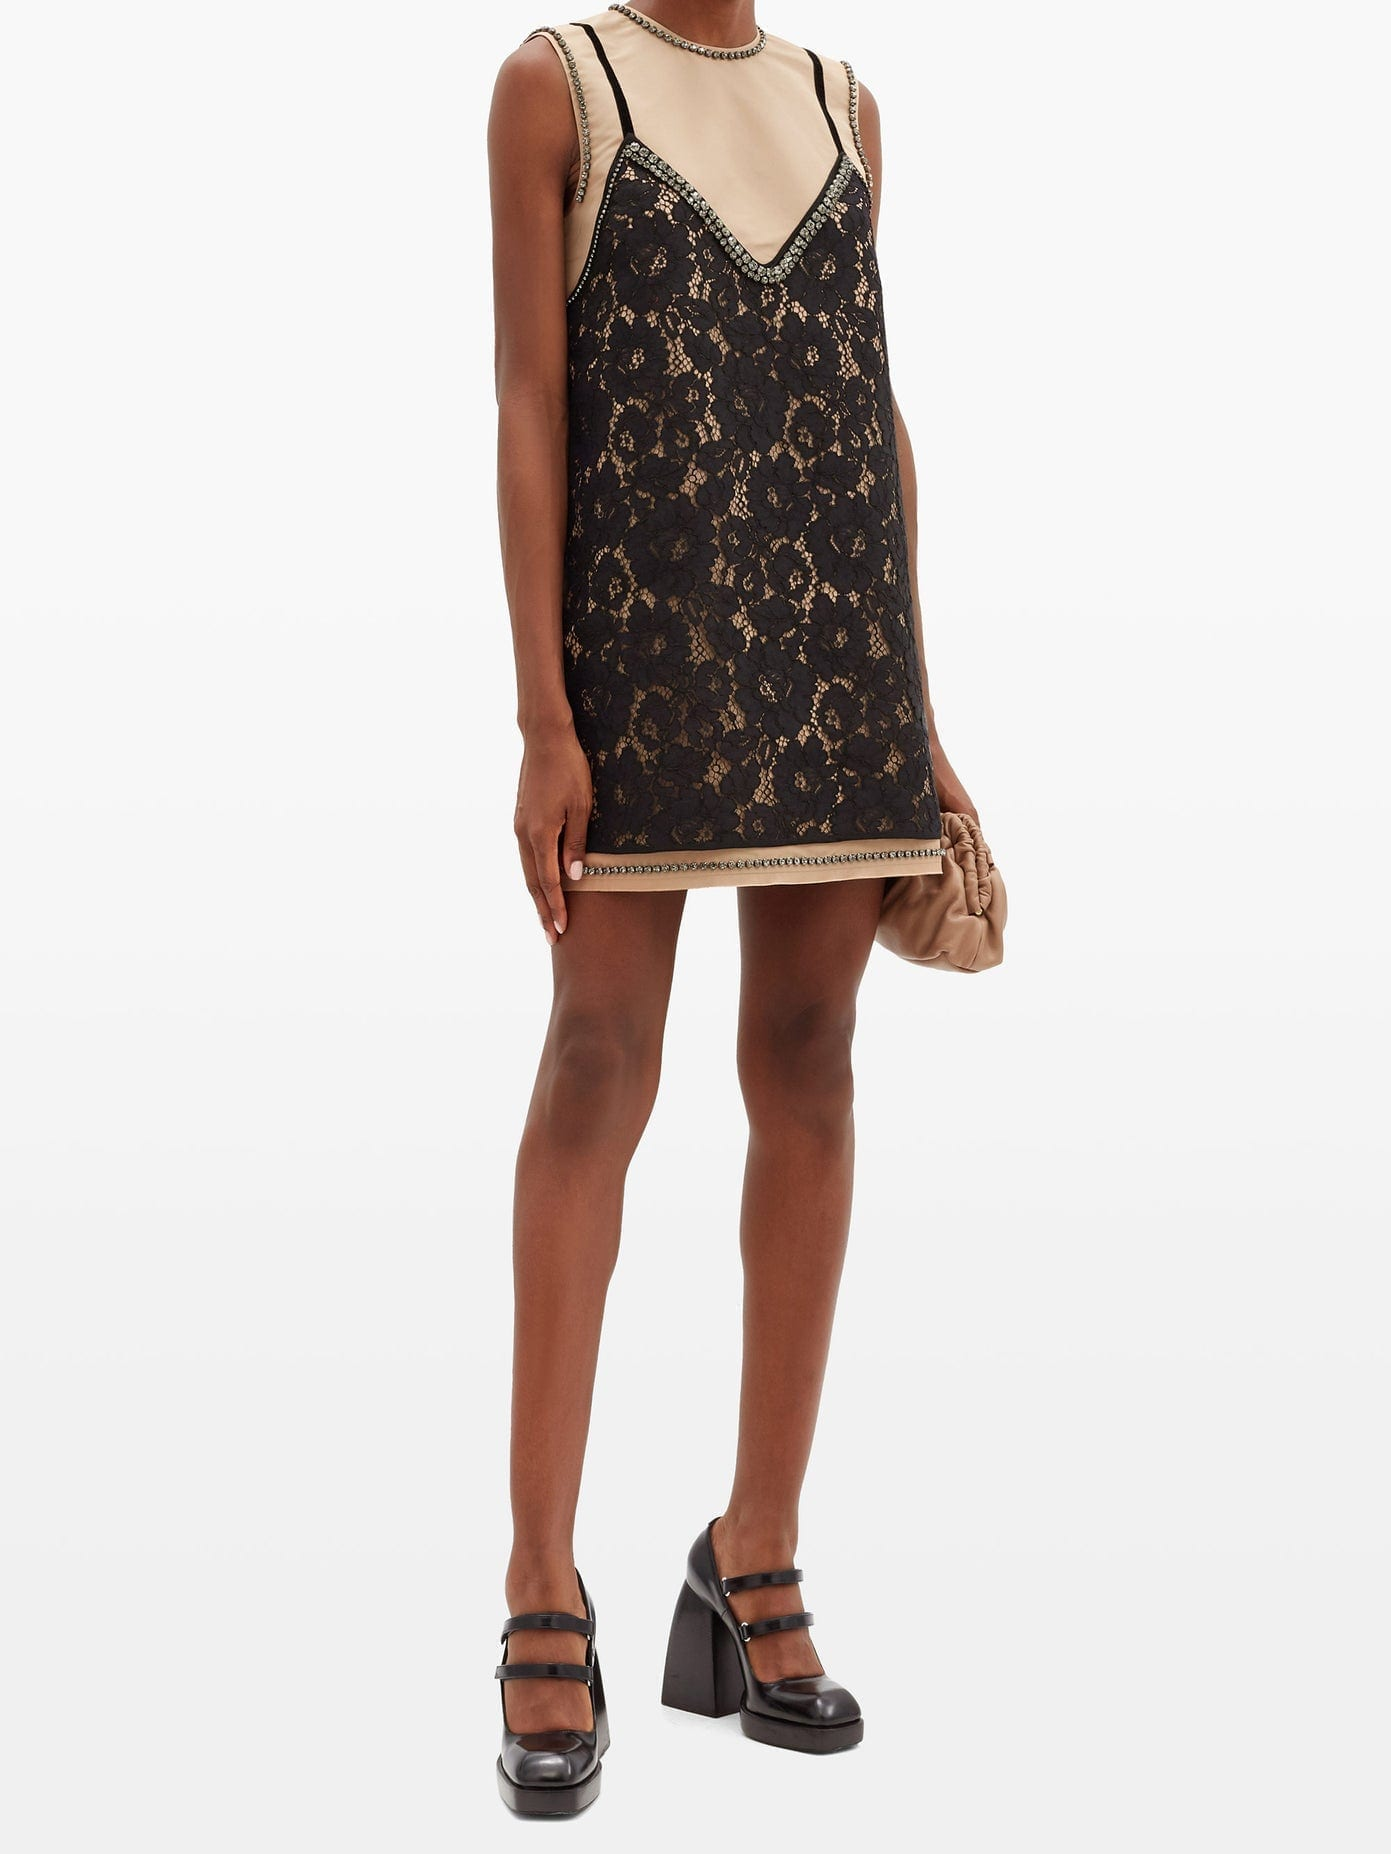 NO. 21 Lace-overlay Crystal-embellished Mini Dress